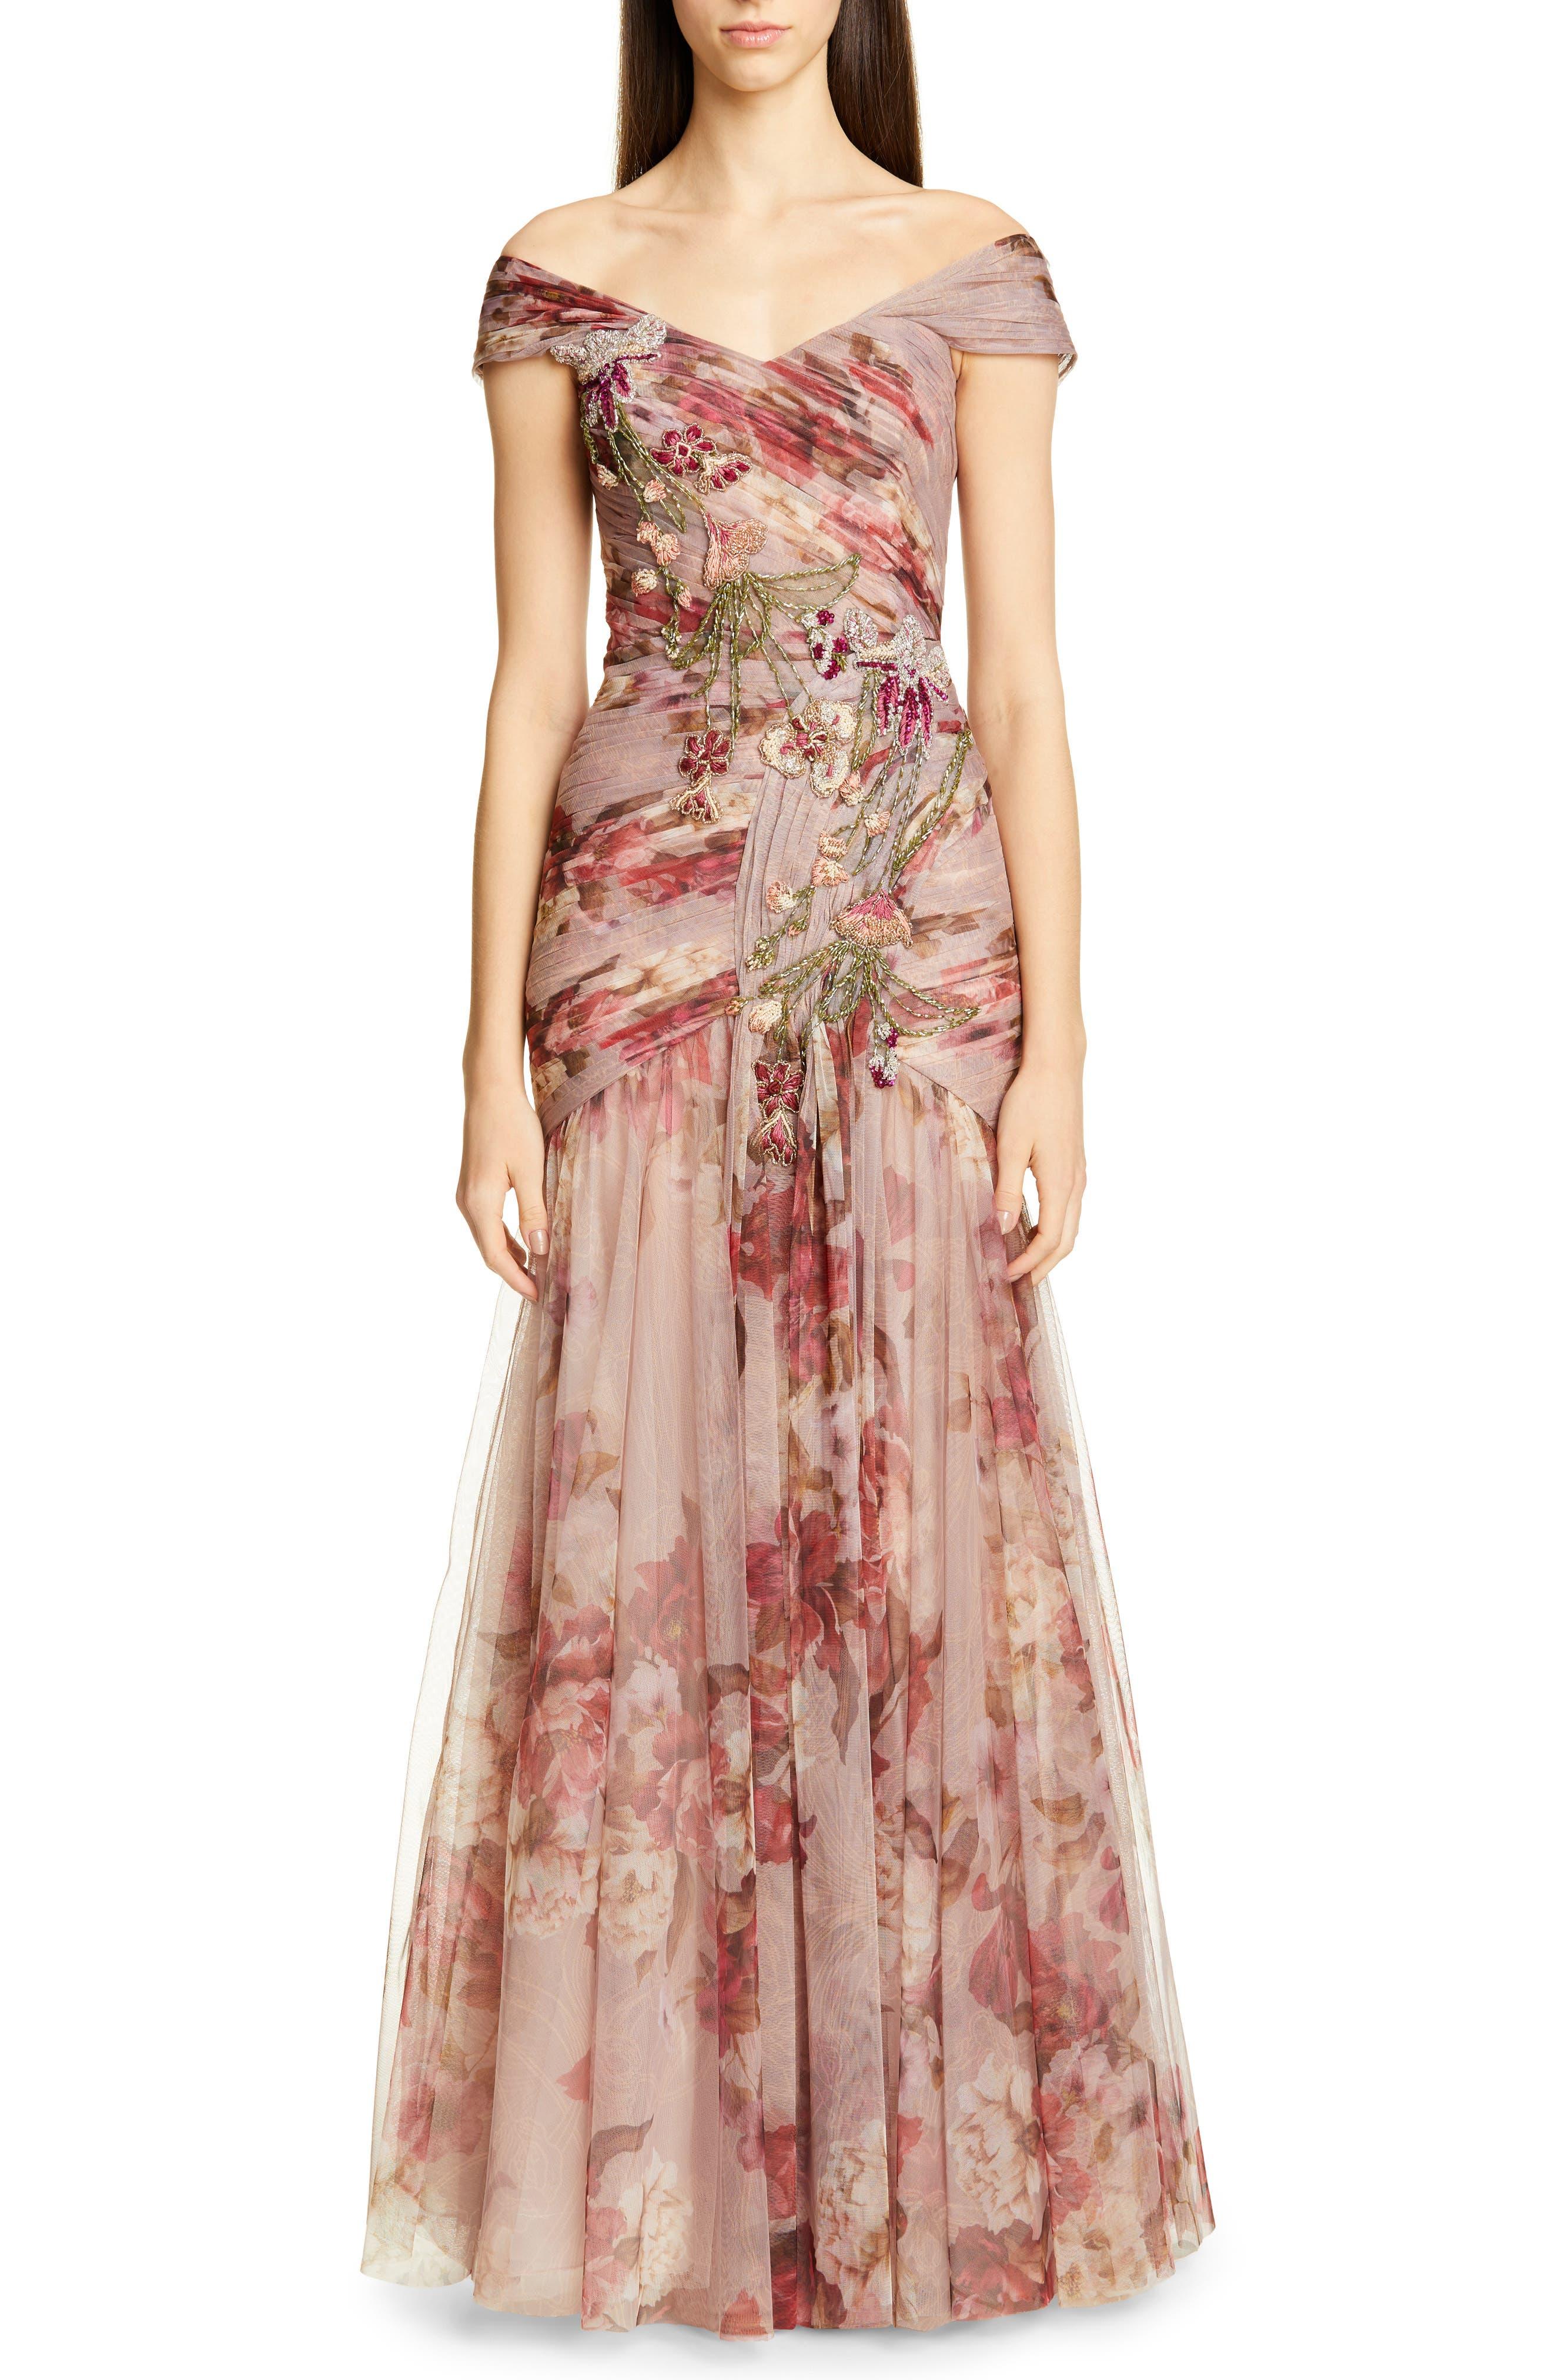 Patbo Bead Embellished Floral Print Off The Shoulder Gown, US / 40 BR - Purple